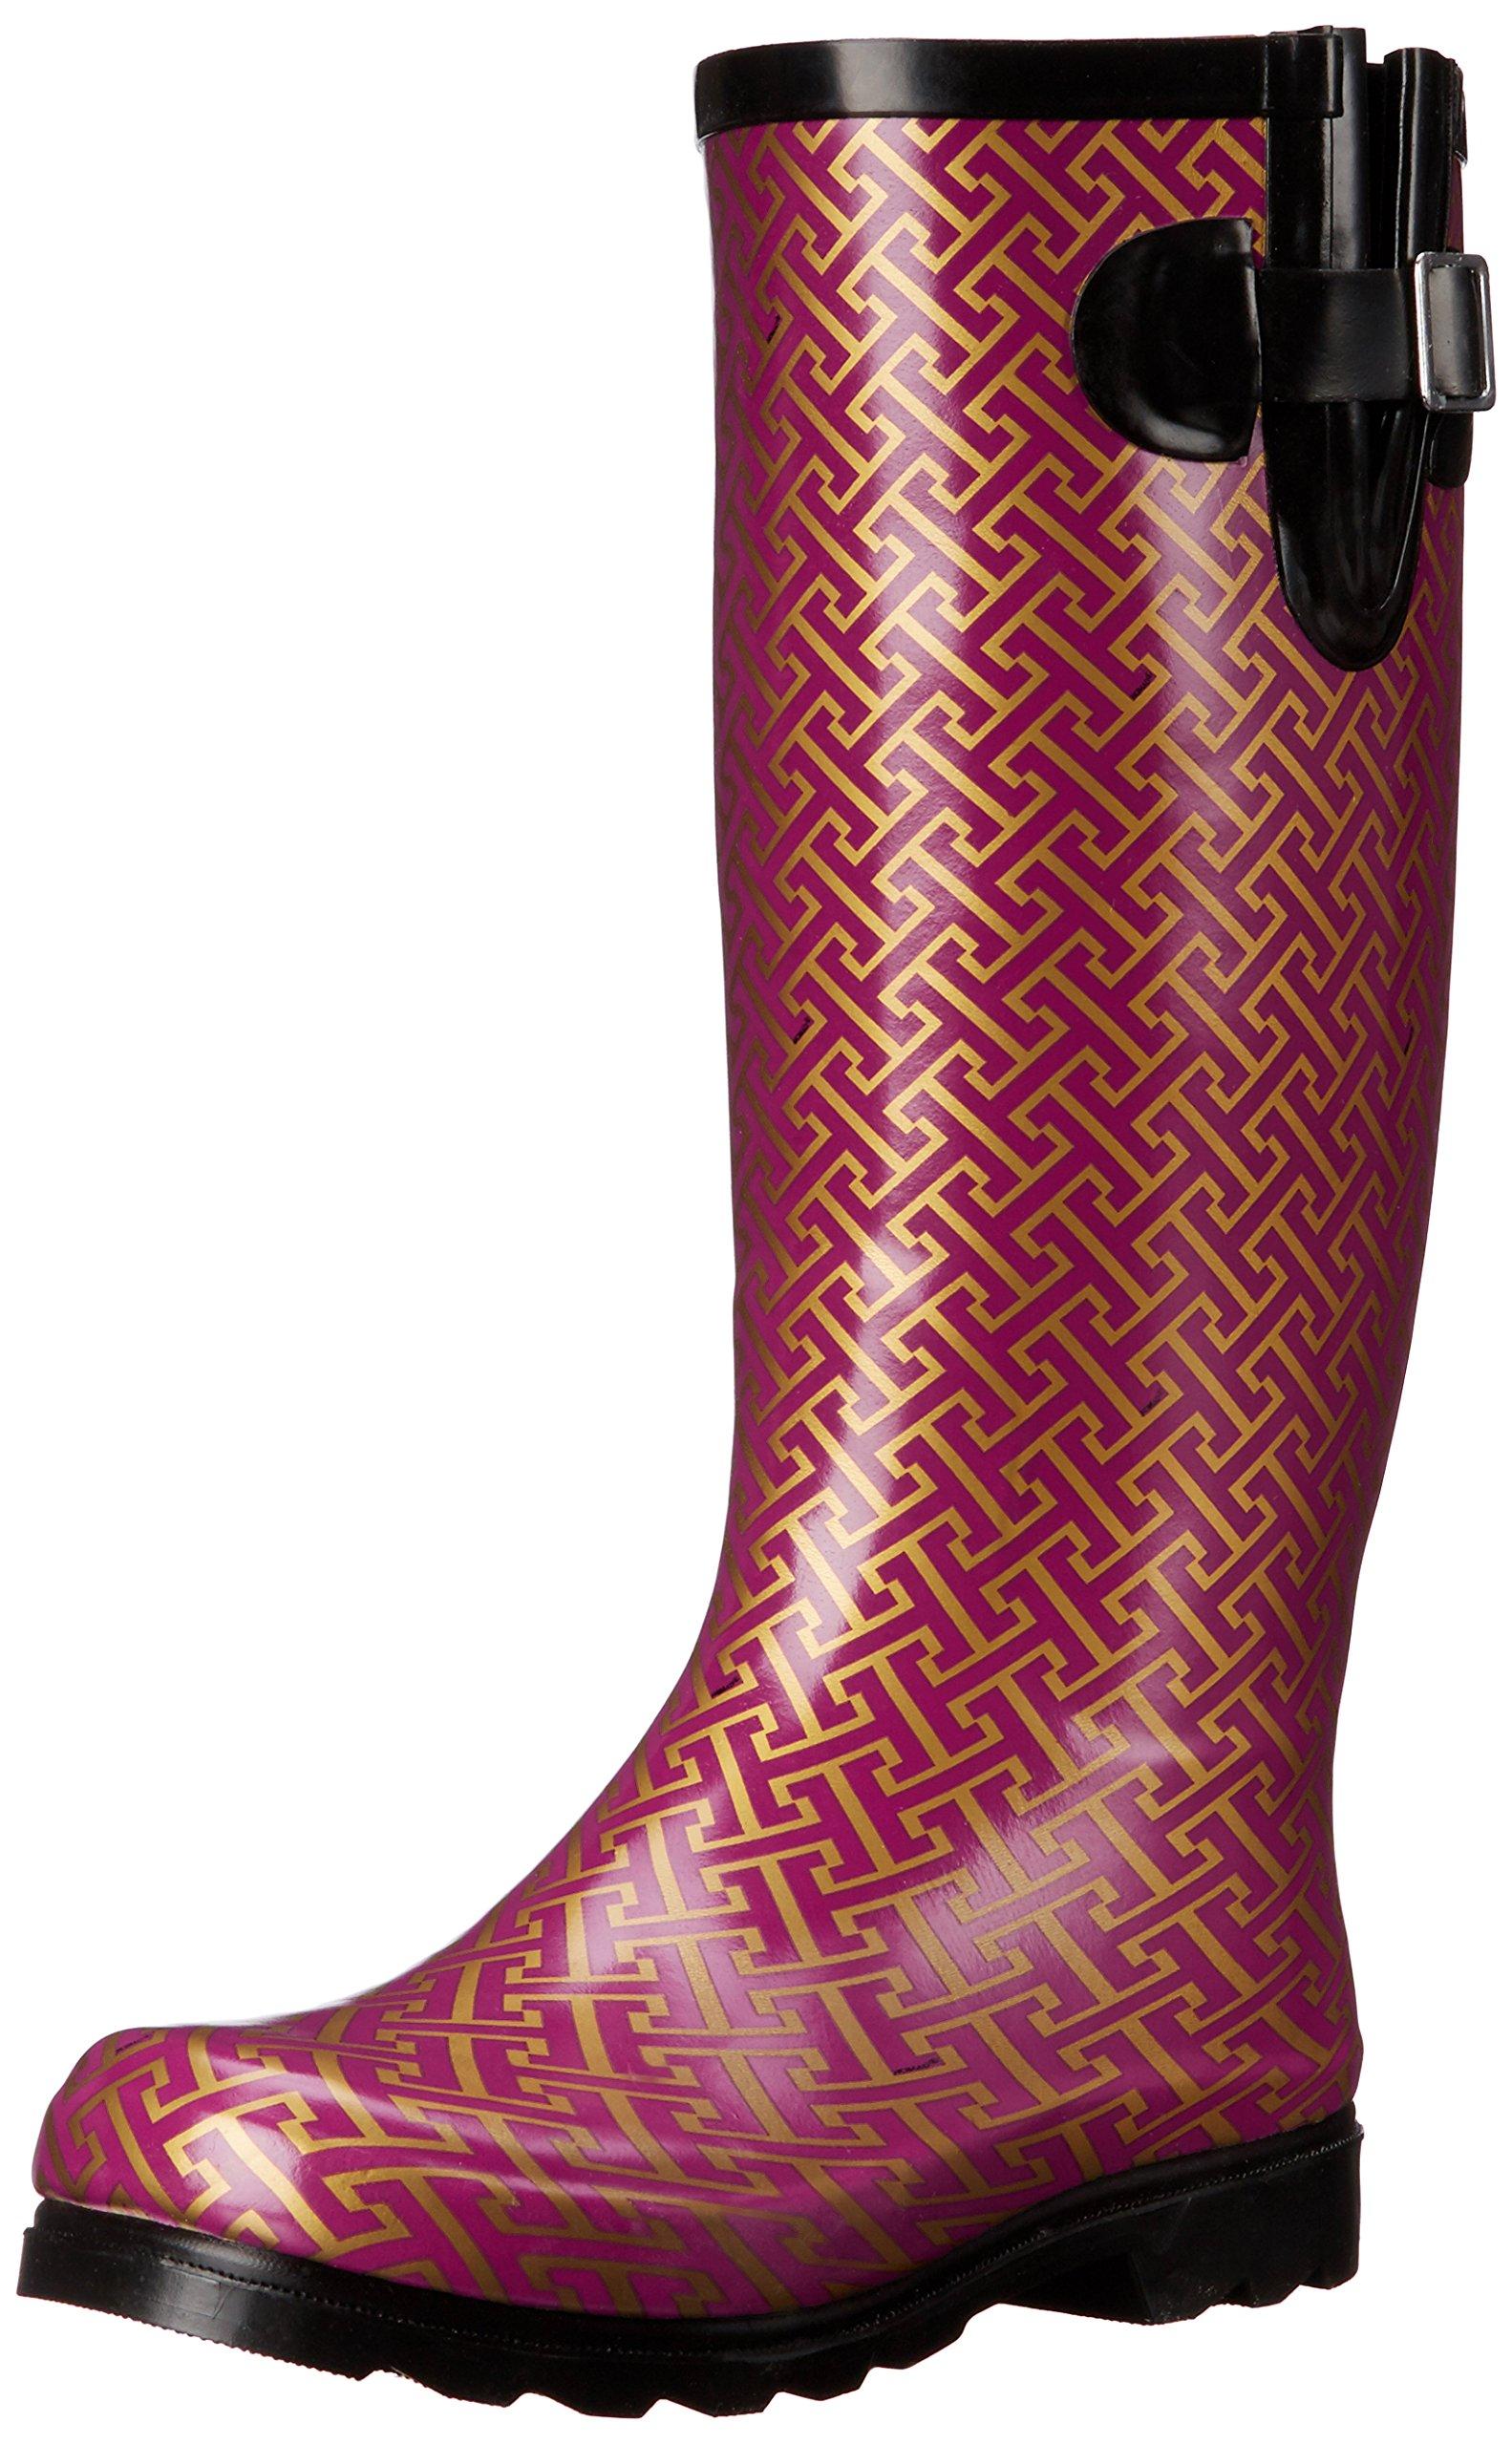 Nomad Women's Puddles Rain Boot, Berry/Gold Hatch, 8 M US